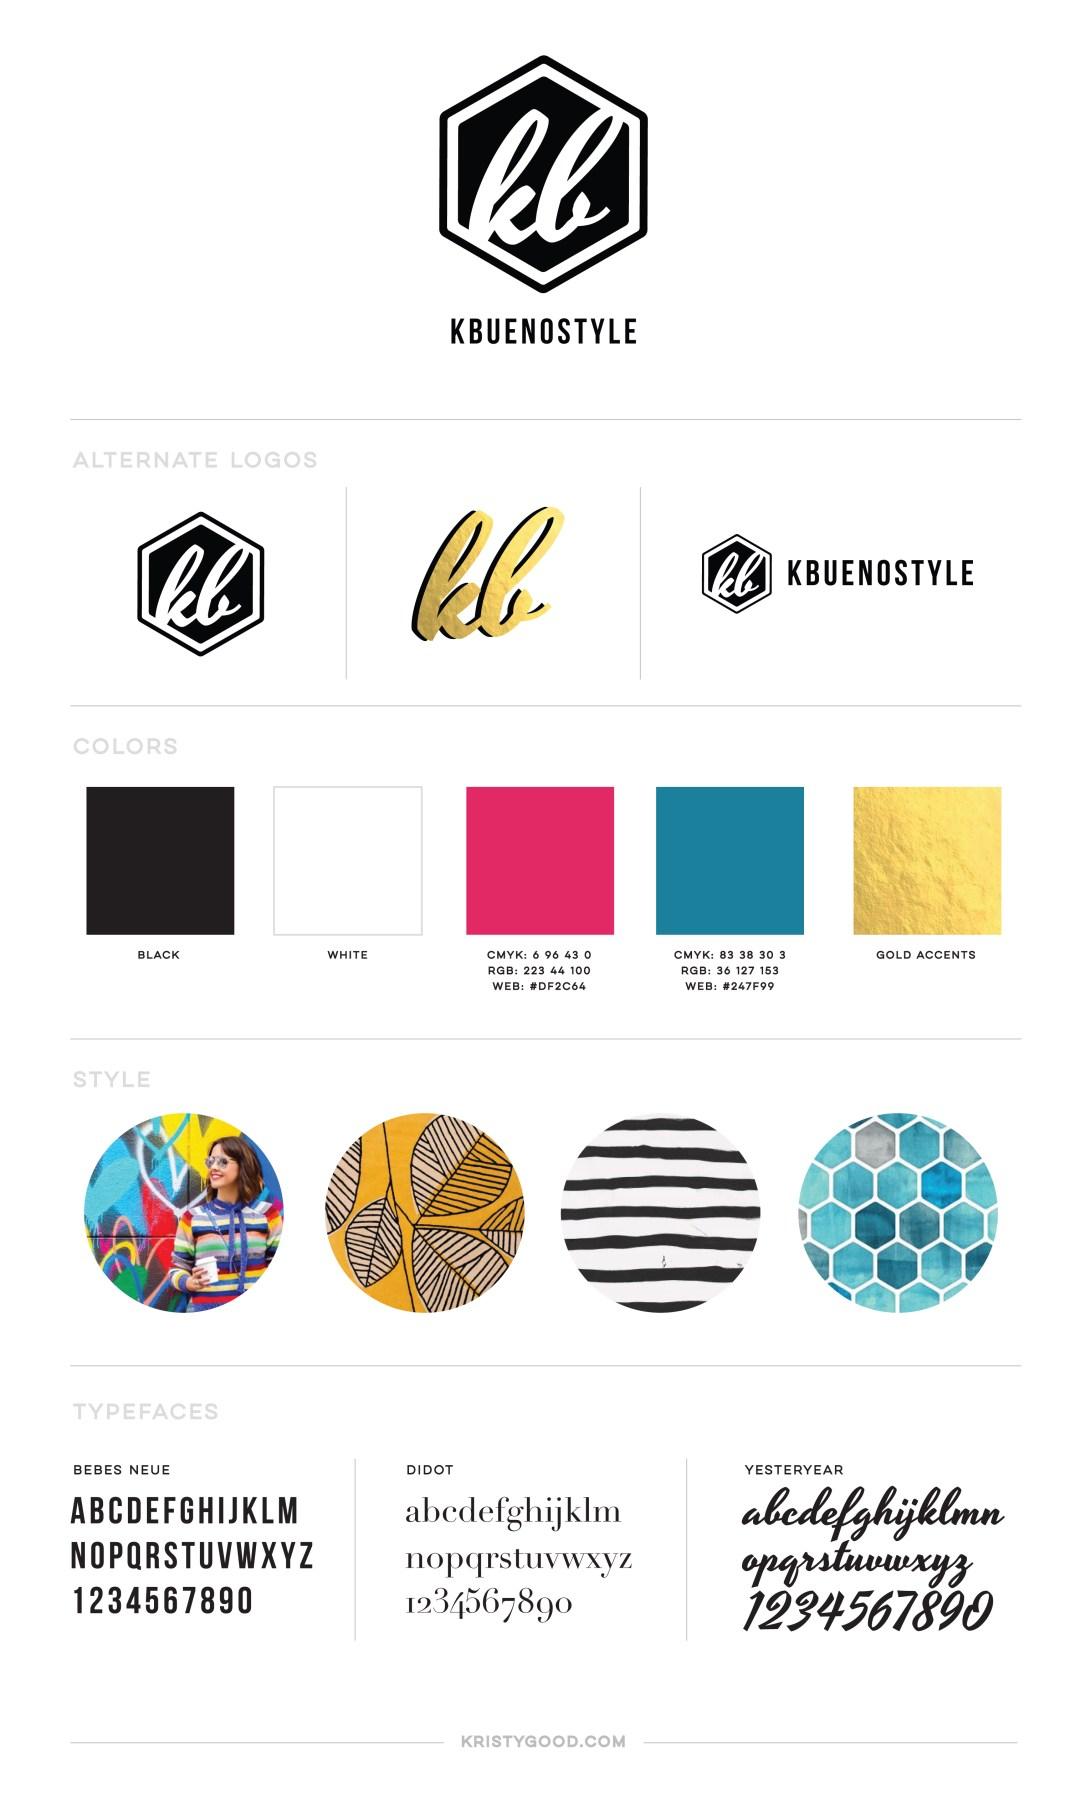 kbuenostyle branding guide